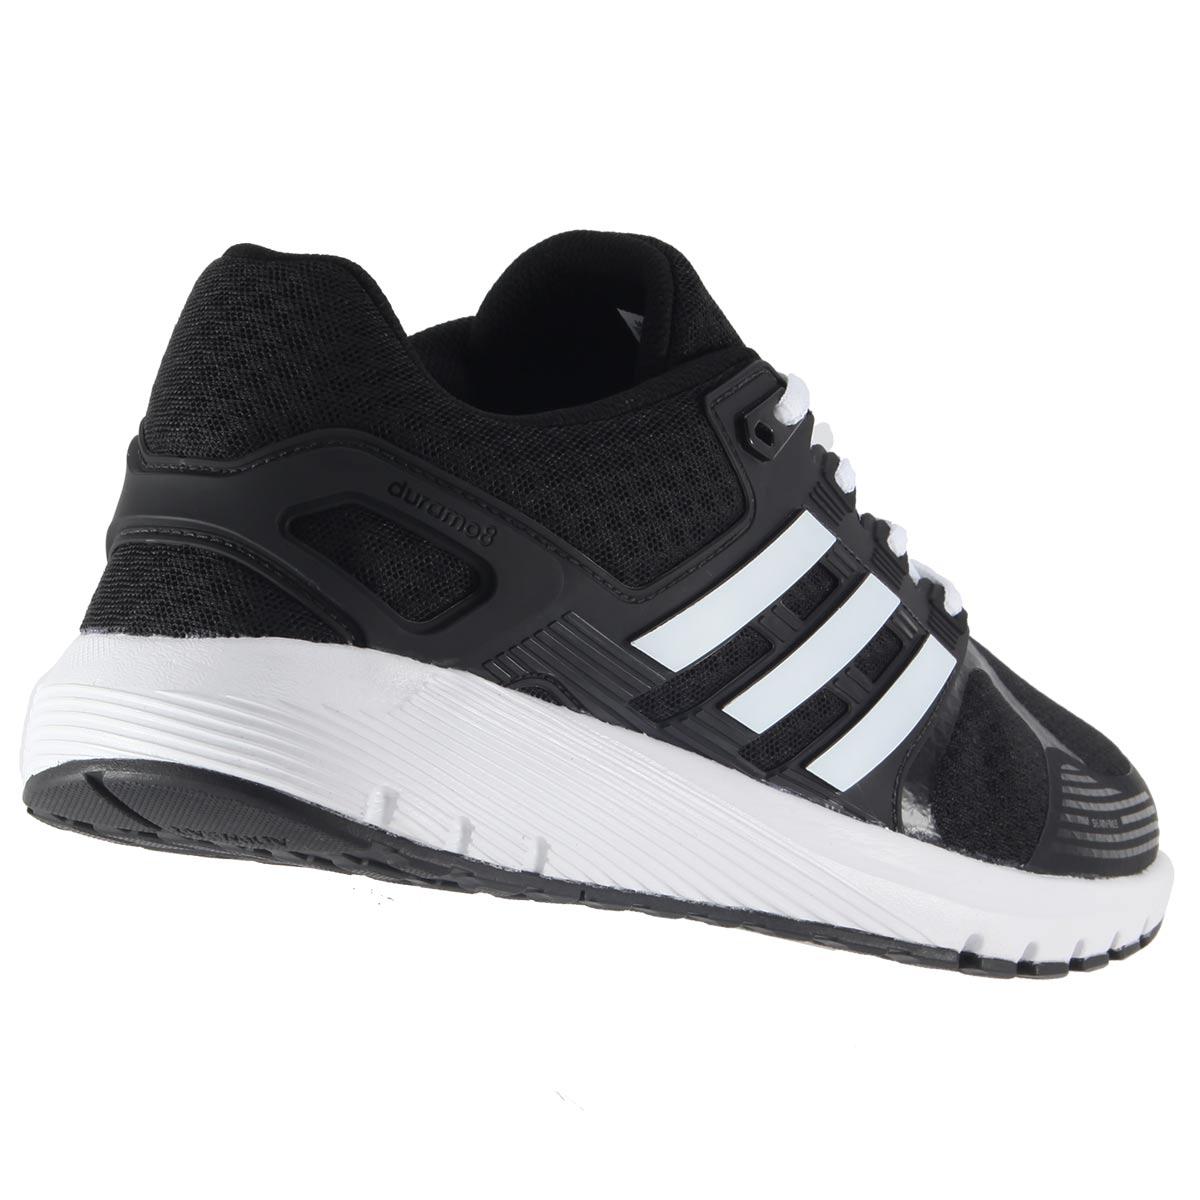 Tênis Adidas Duramo 8 Masculino Caminhada Corrida BA8078